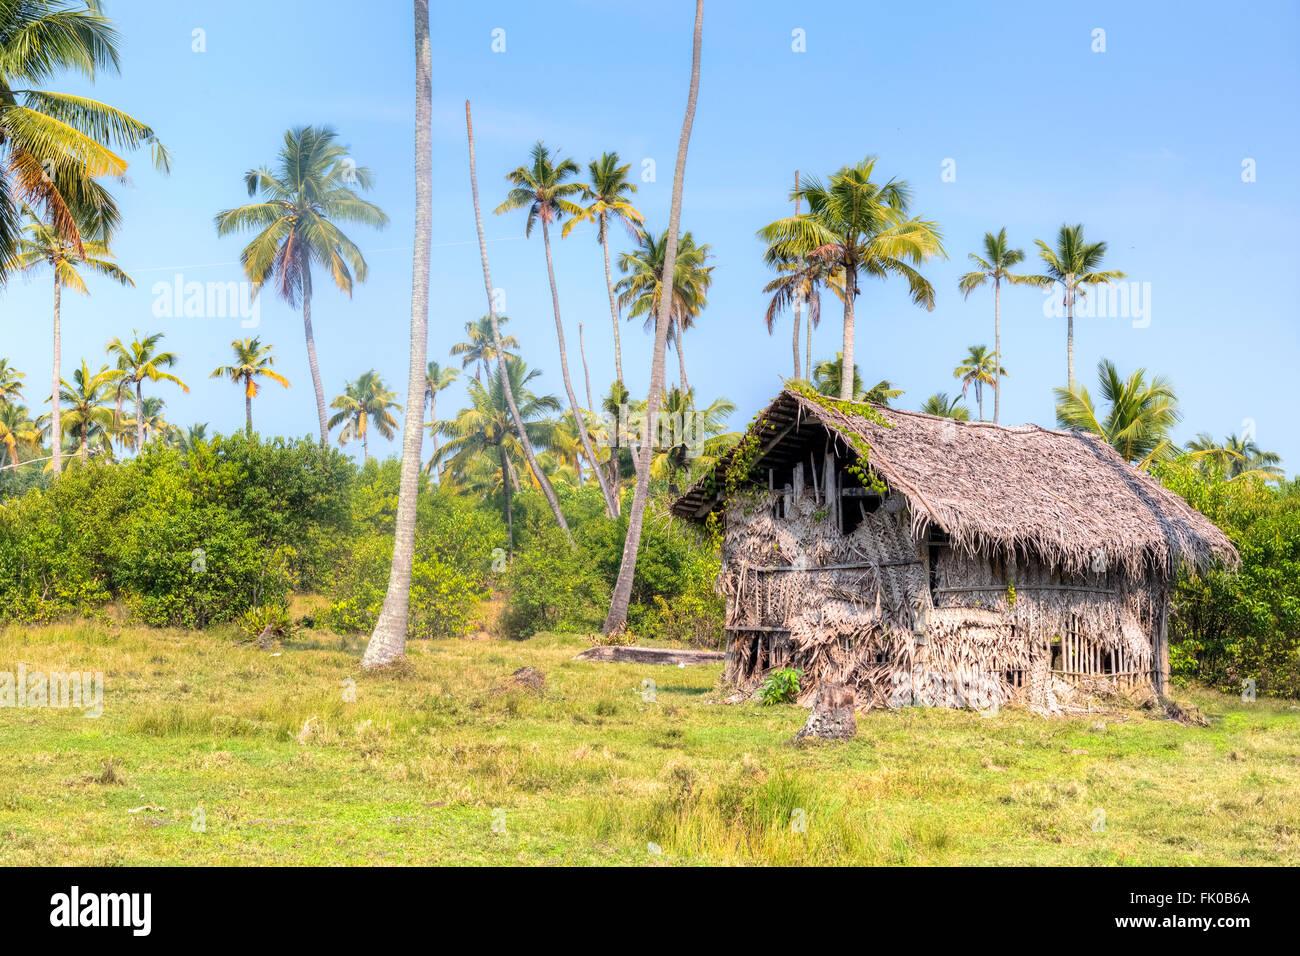 Une cabane dans la jungle de Kochi, Kerala, Inde, Asie Photo Stock